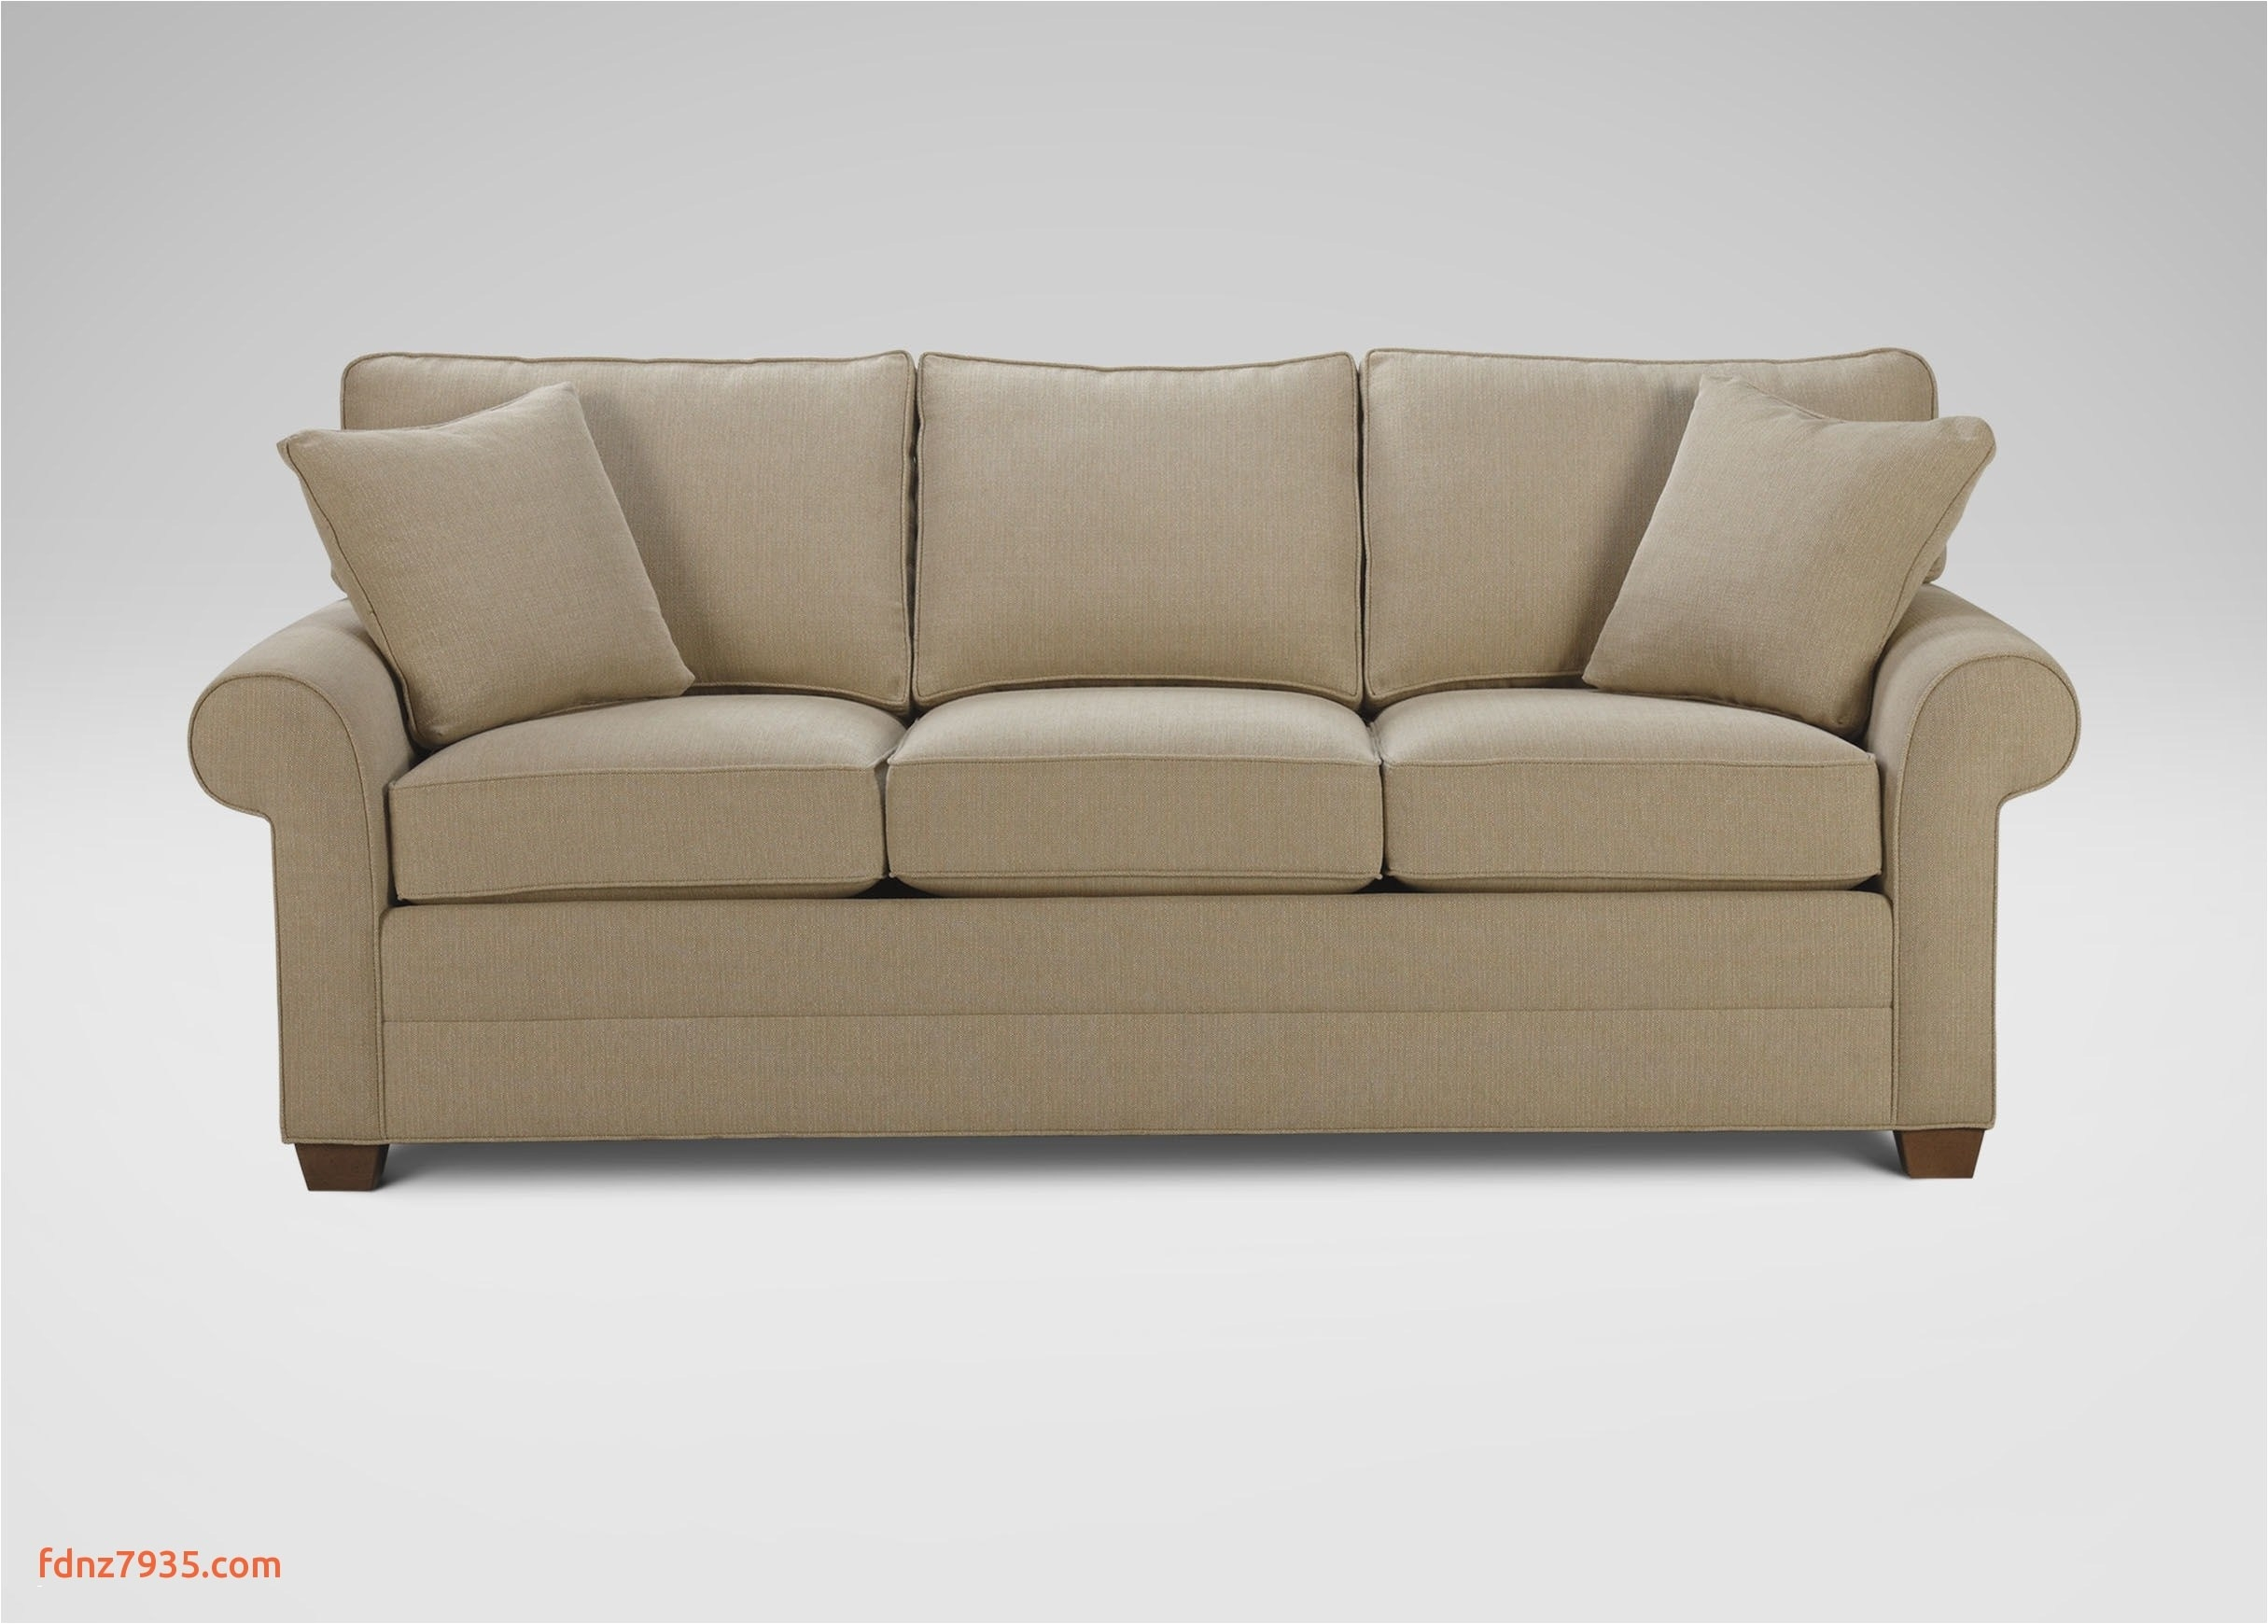 Ethan Allen Sleeper sofa with Air Mattress the Best Ethan Allen Sleeper sofas – Fresh sofa